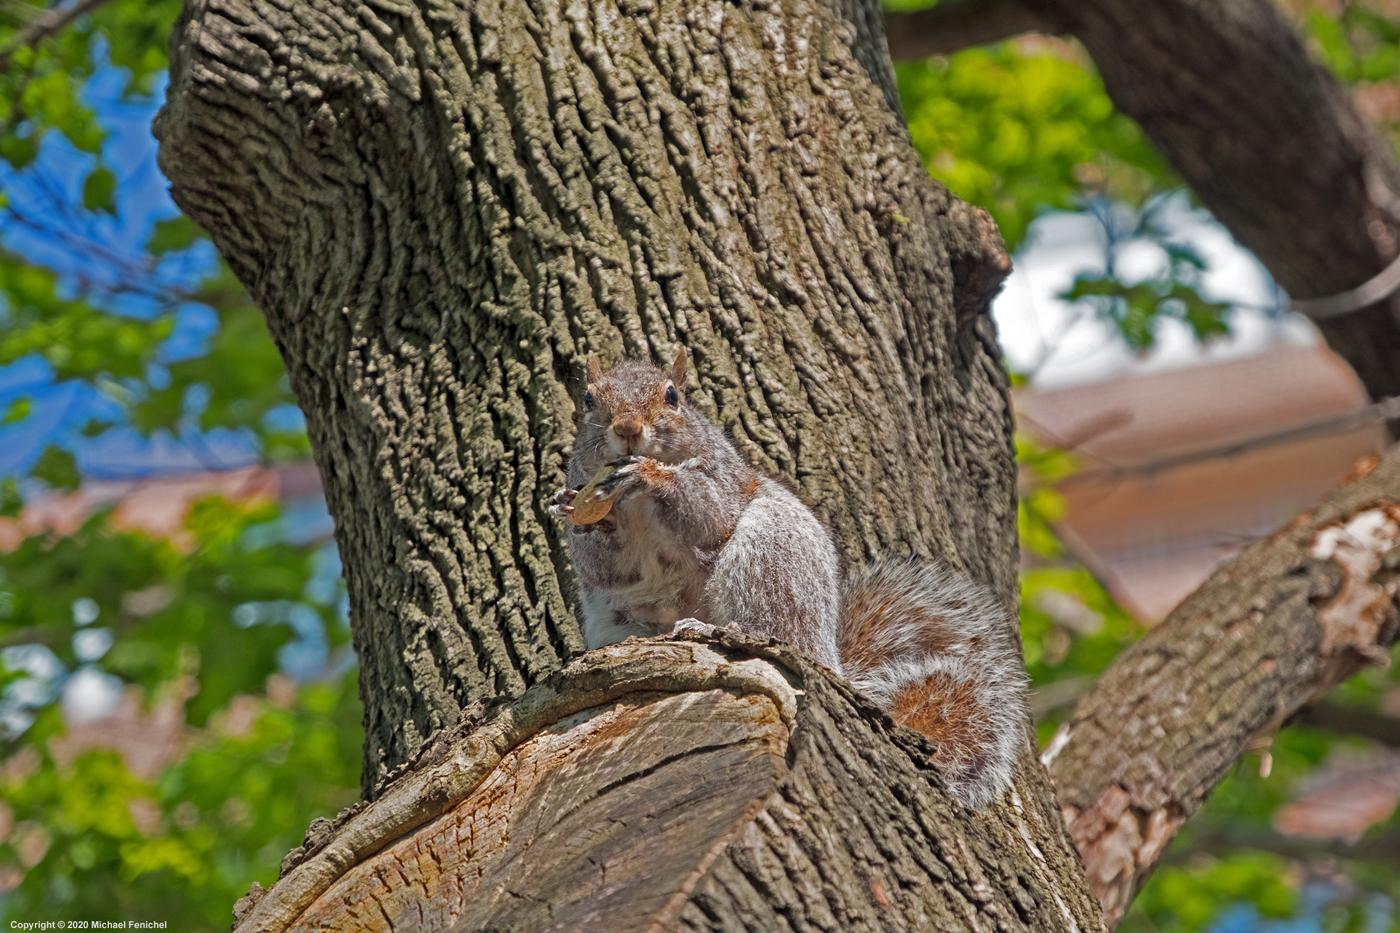 Squirrel - Sometimes You Feel Like a Nut]